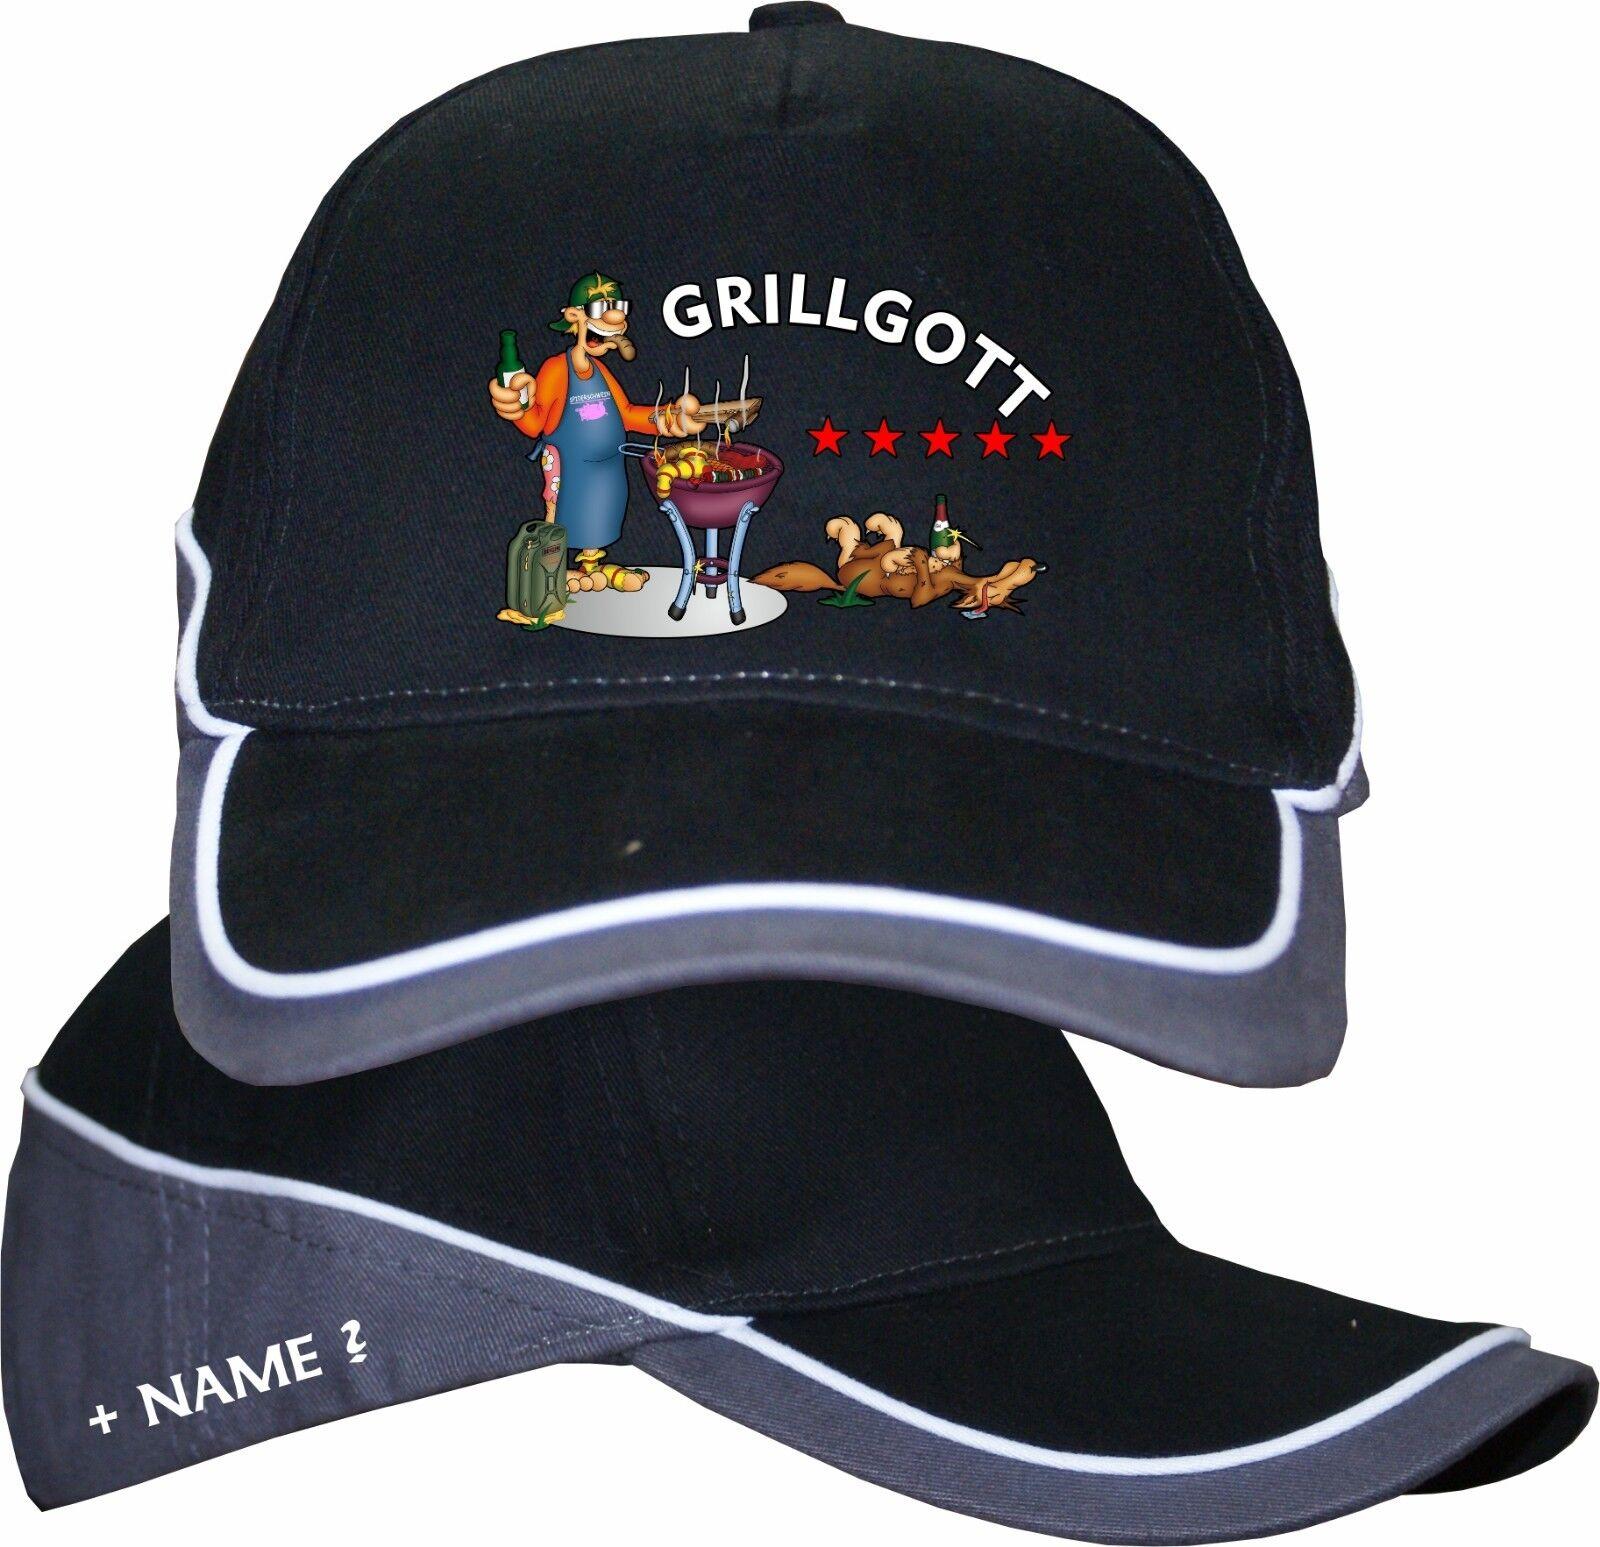 Grillgott Grillmeister Base Cap Kappe Basecap Mütze Grillmütze Geburtstags 22